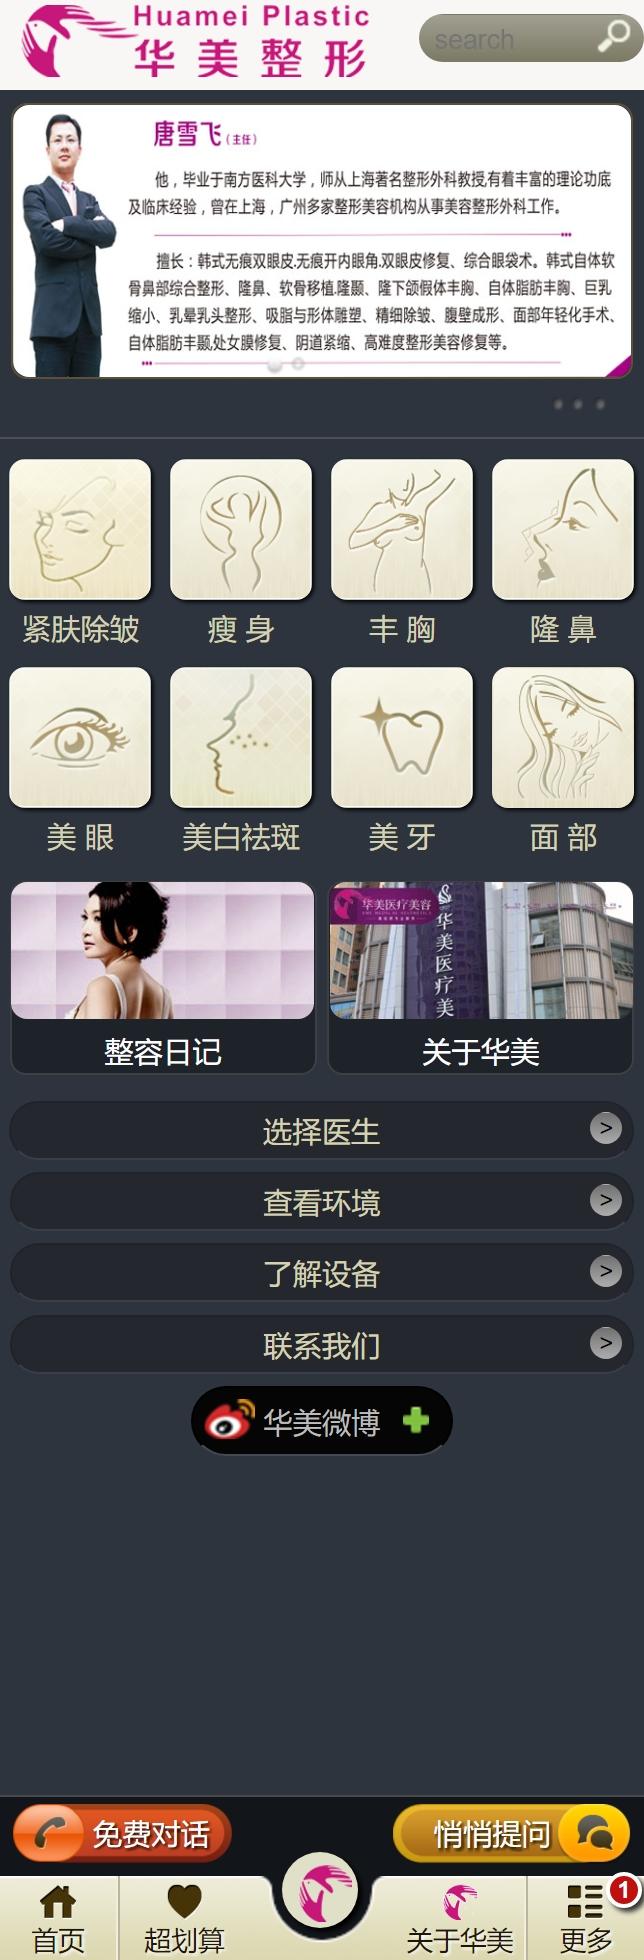 WAP整形医院手机网站织梦dedecms源码 南京康美整形医院手机网站